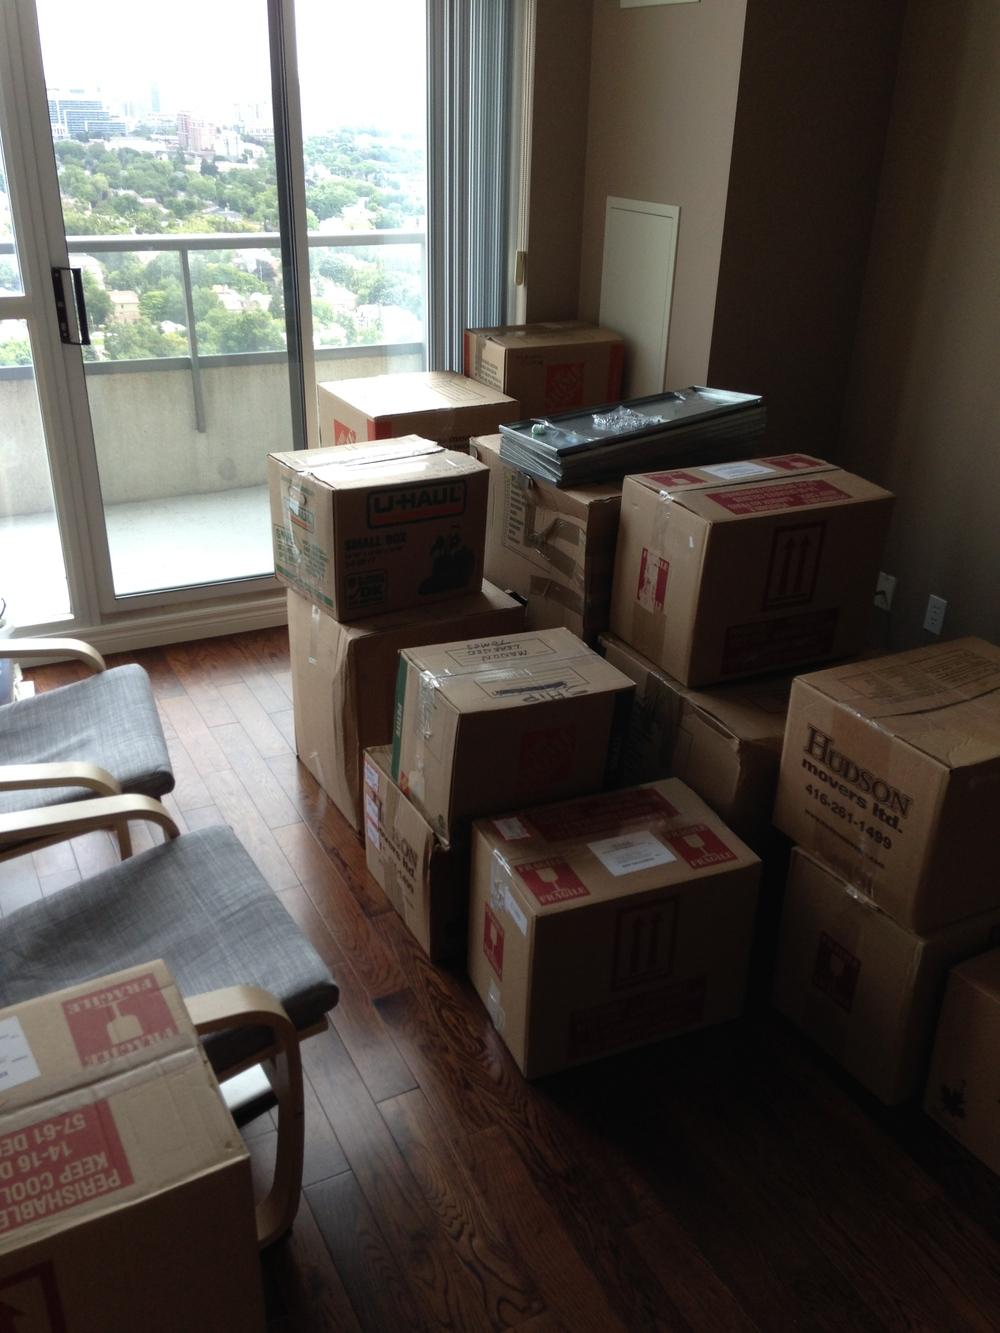 Boxes of Stuff